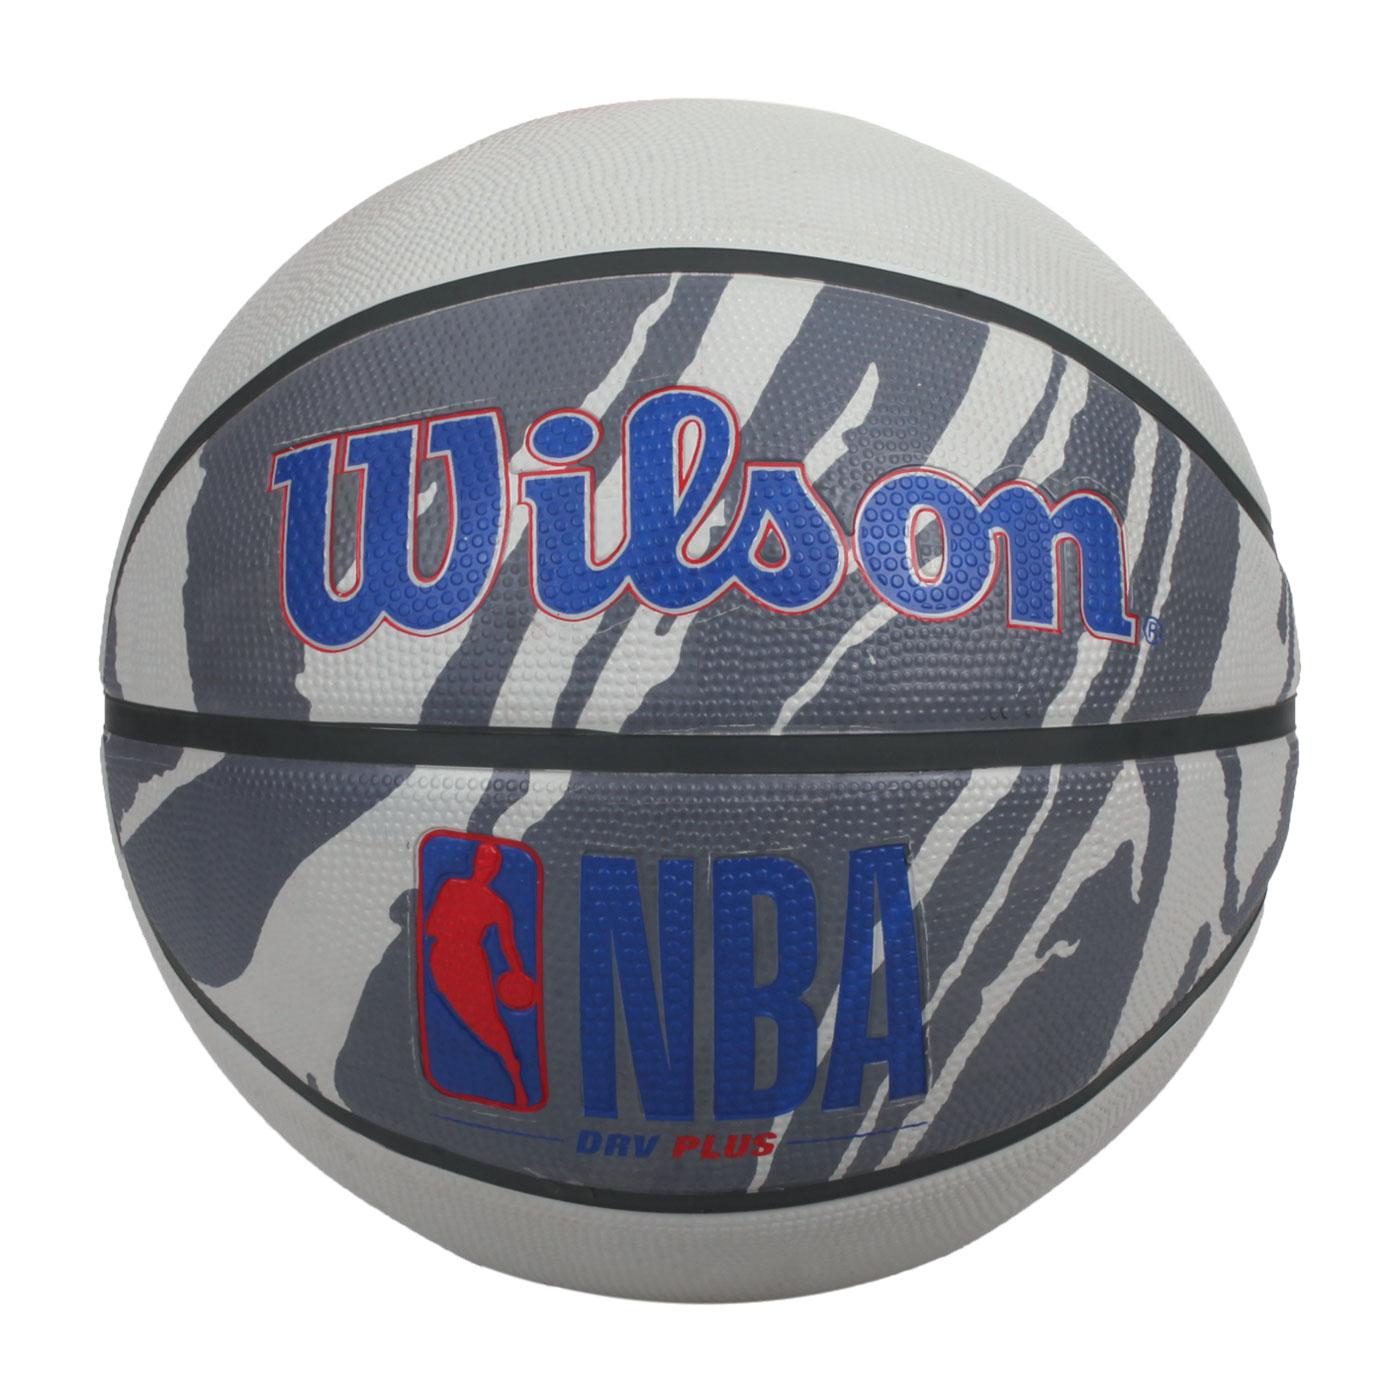 WILSON NBA DRV系列PLUS 橡膠籃球#7 WTB9202XB07 - 灰藍紅